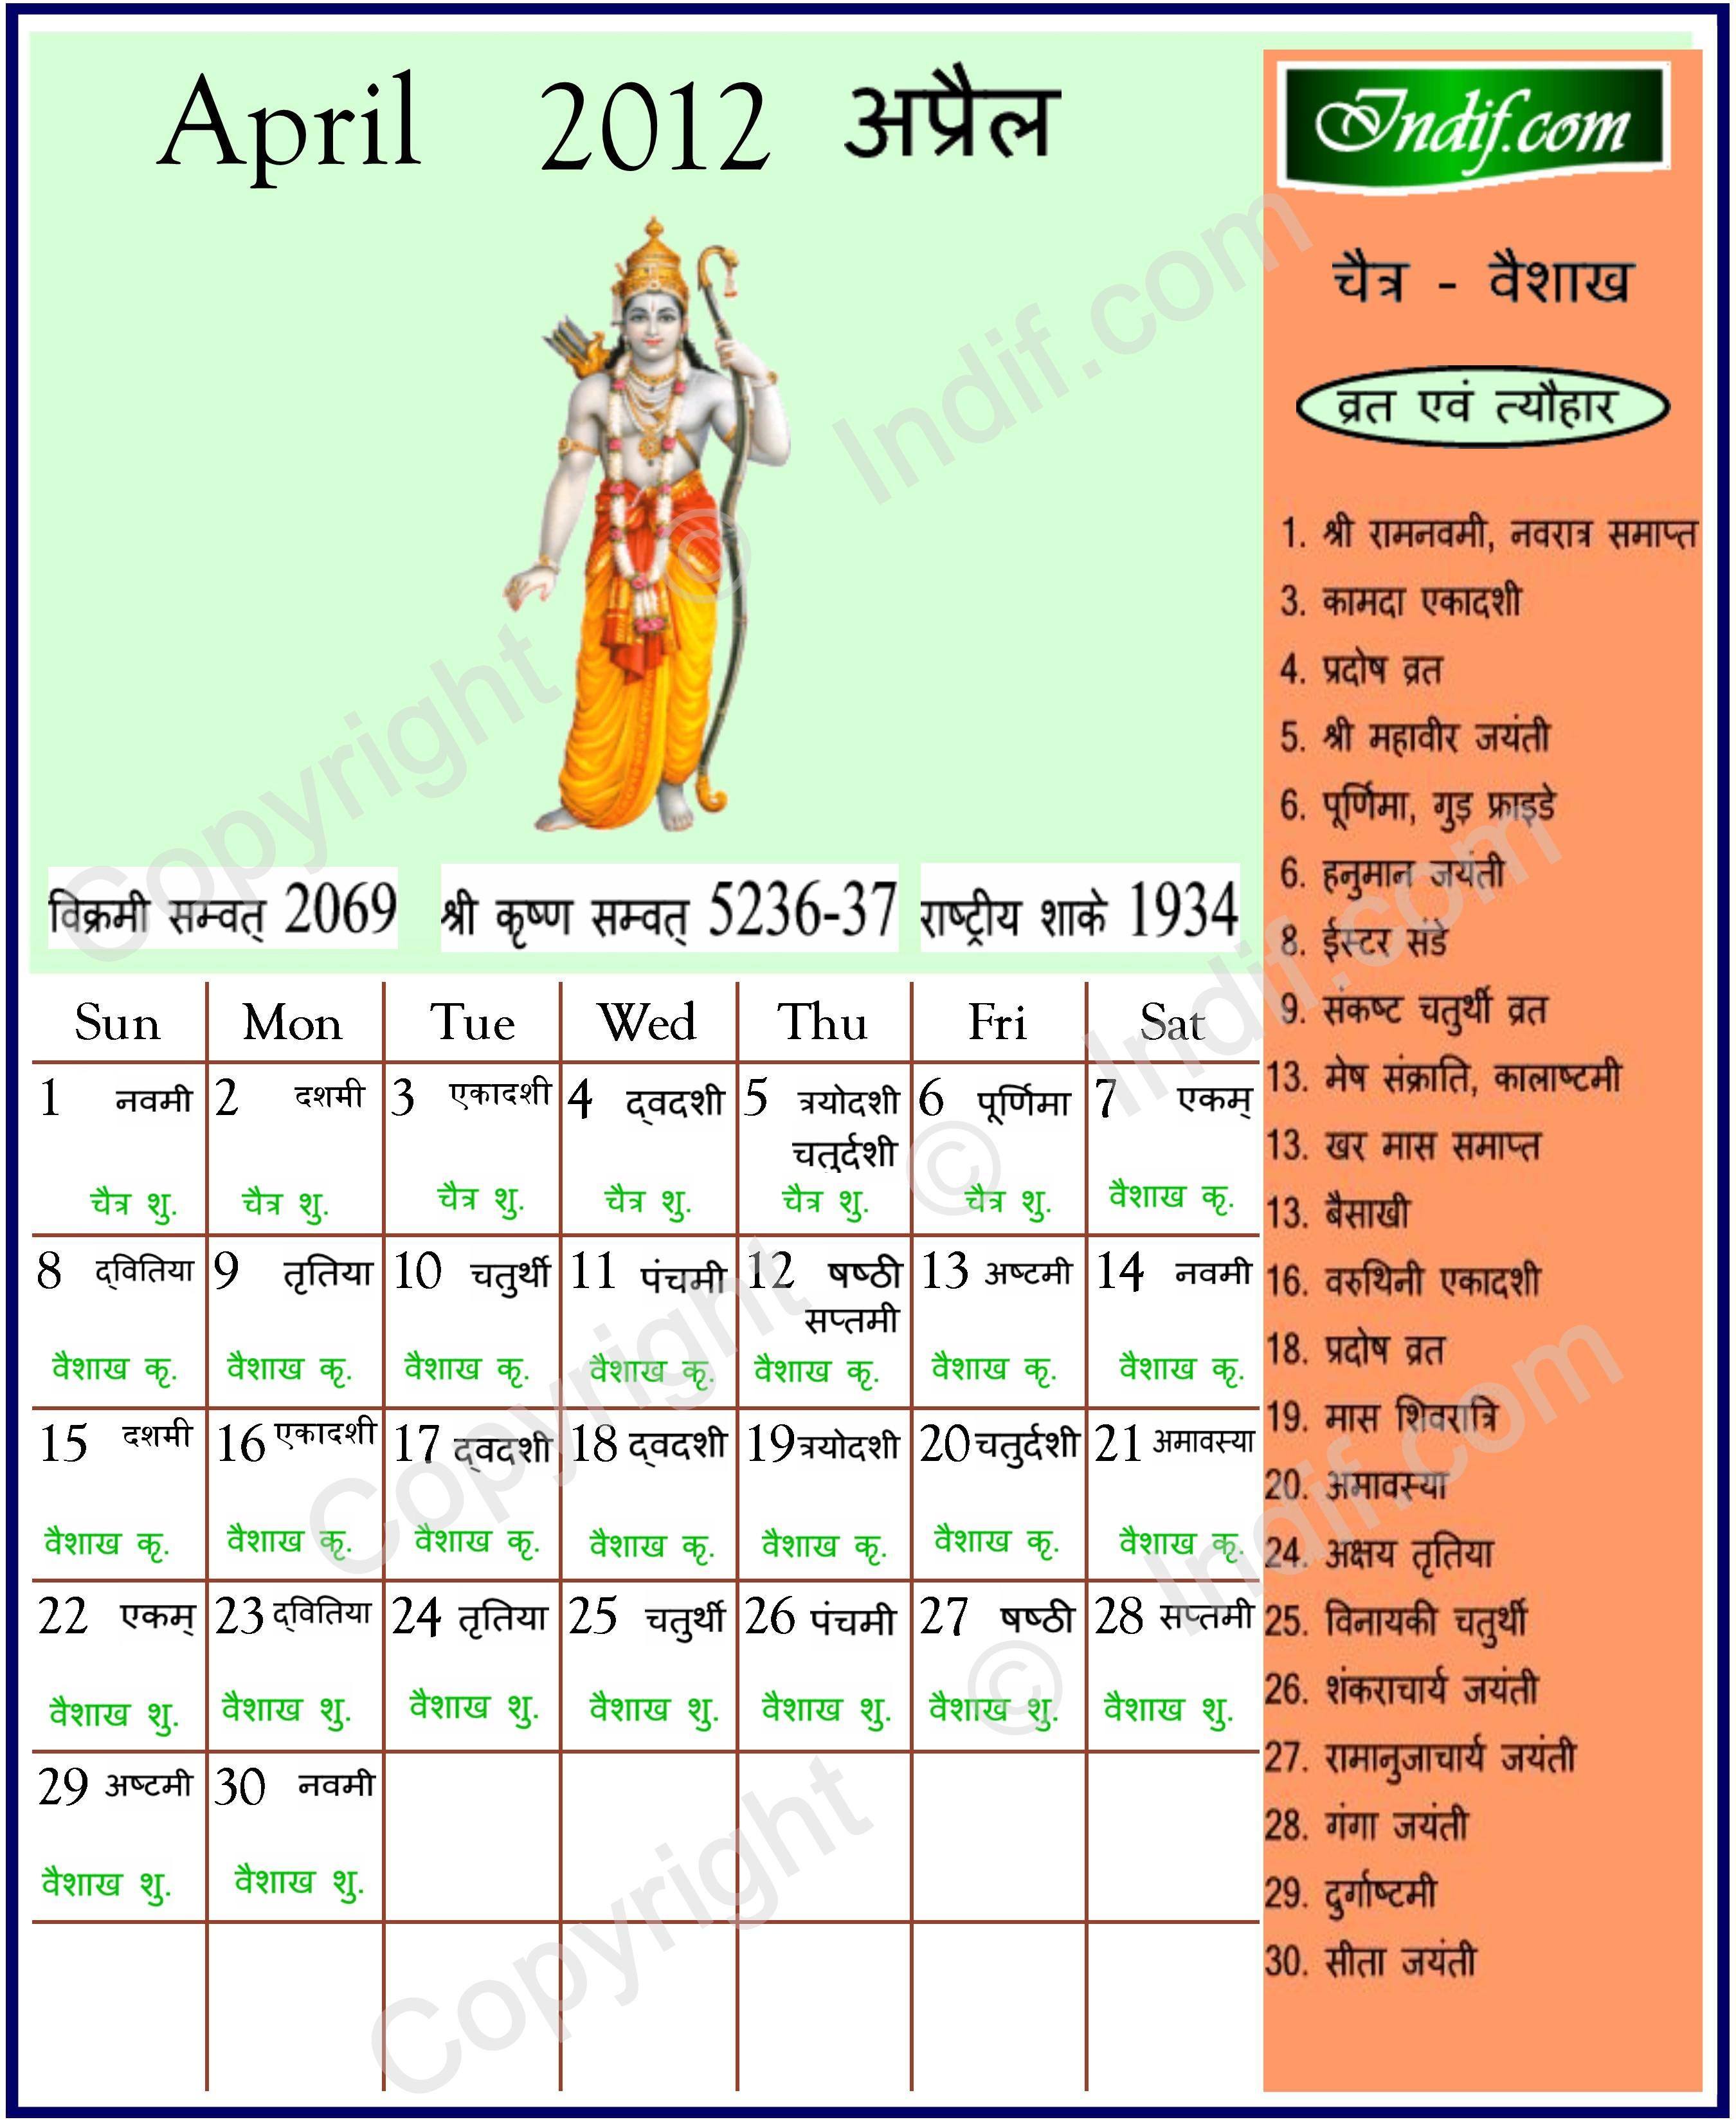 Panchang, Indian Calendar,Hindi Hindu Calendar, India Festival